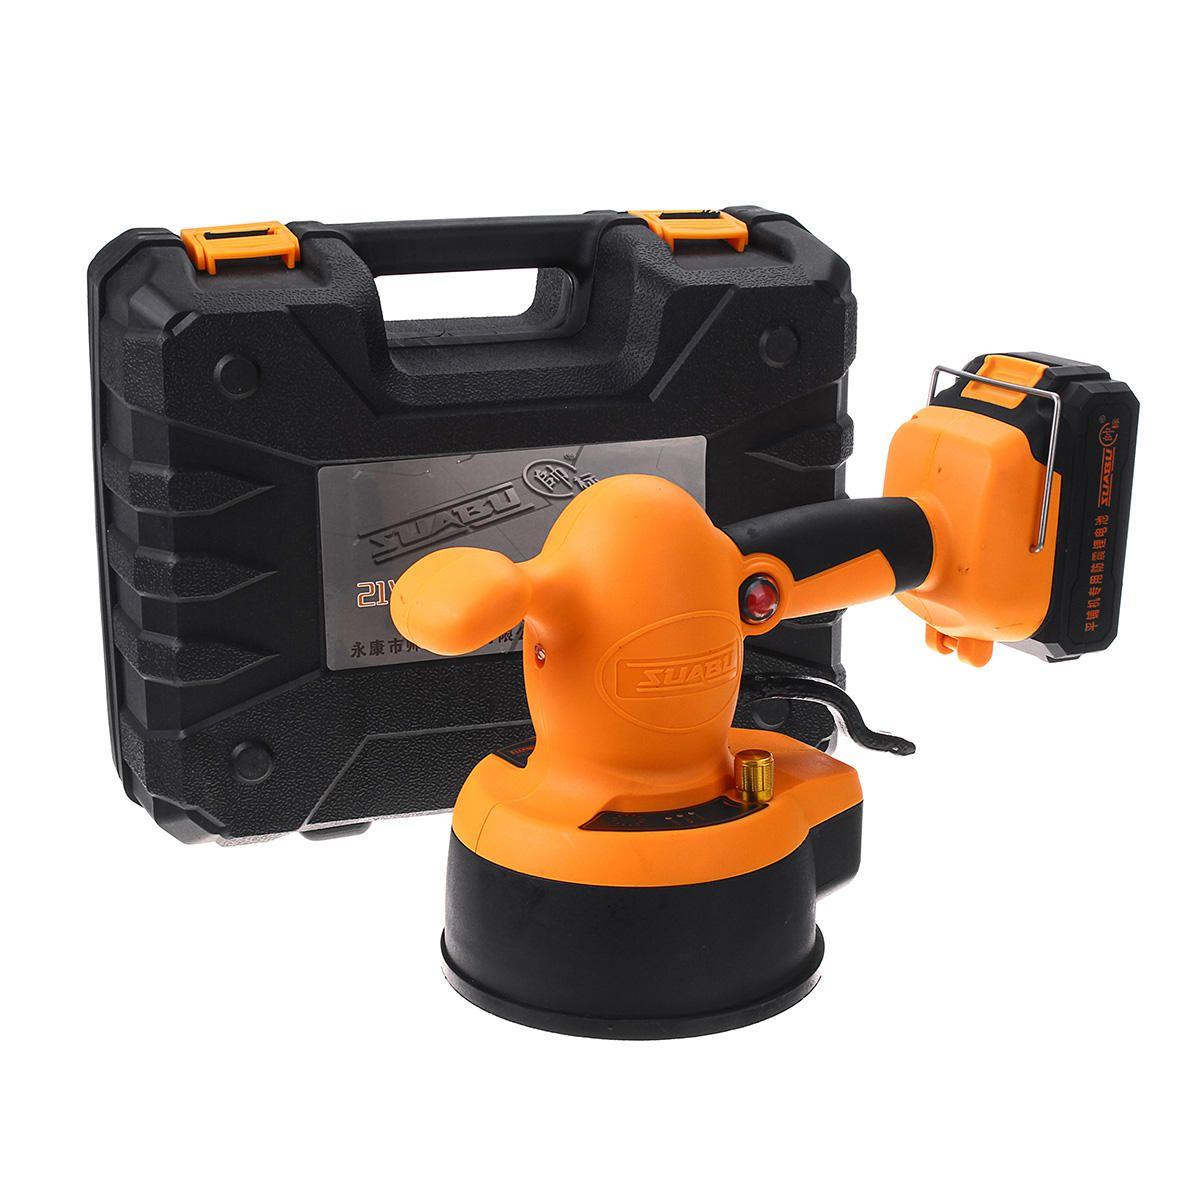 13000mAh Professional Tiling Tool Machine Suction Porcelain Ceramic Floor Grip Handle Electric Floor Vibrator